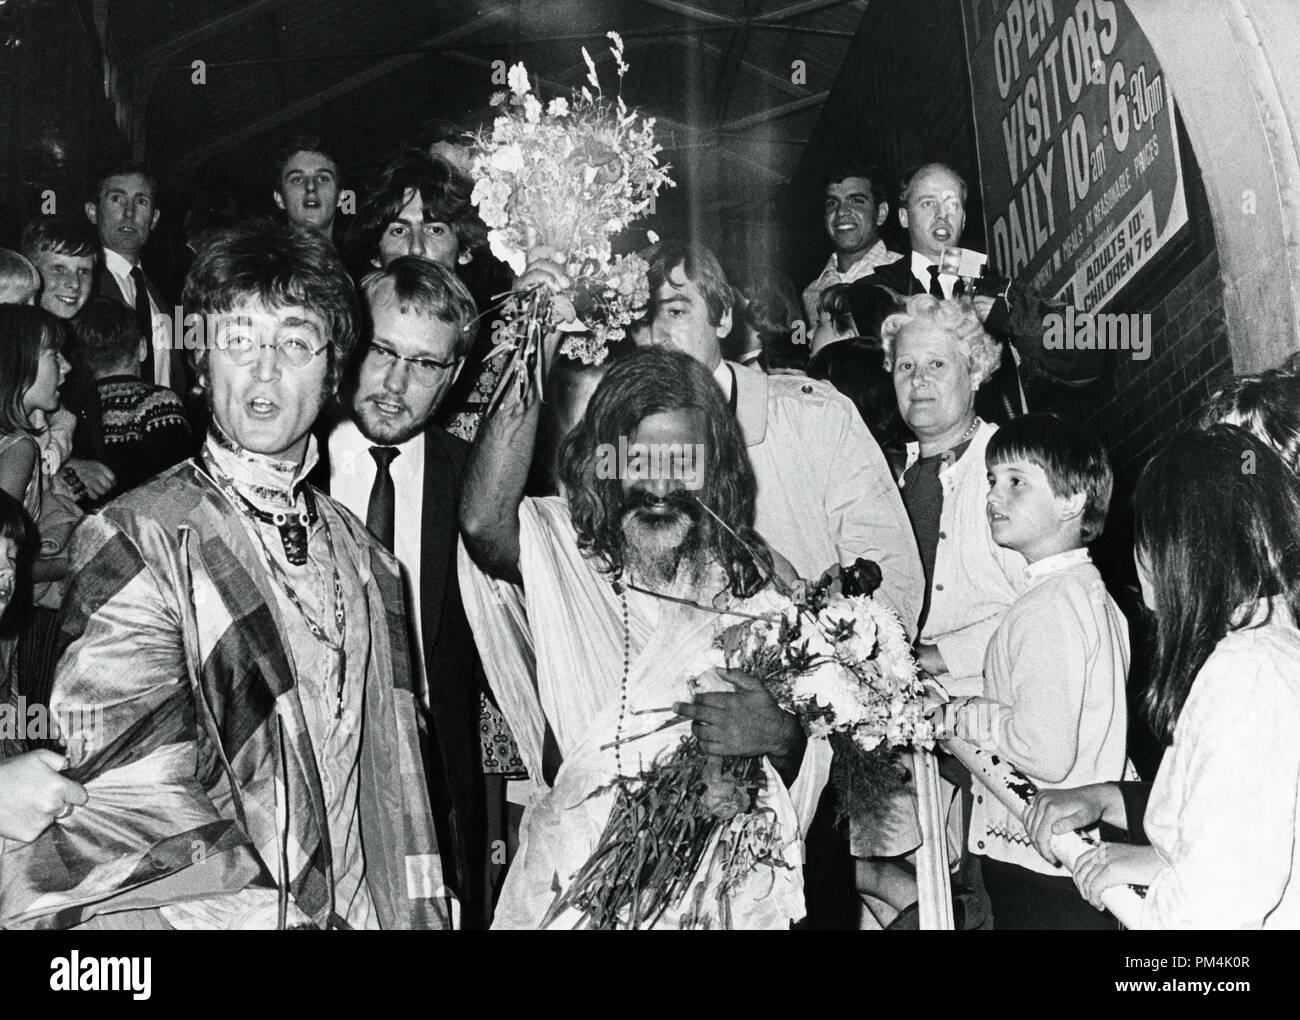 Maharishi Mahesh Yogi Beatles High Resolution Stock Photography And Images Alamy